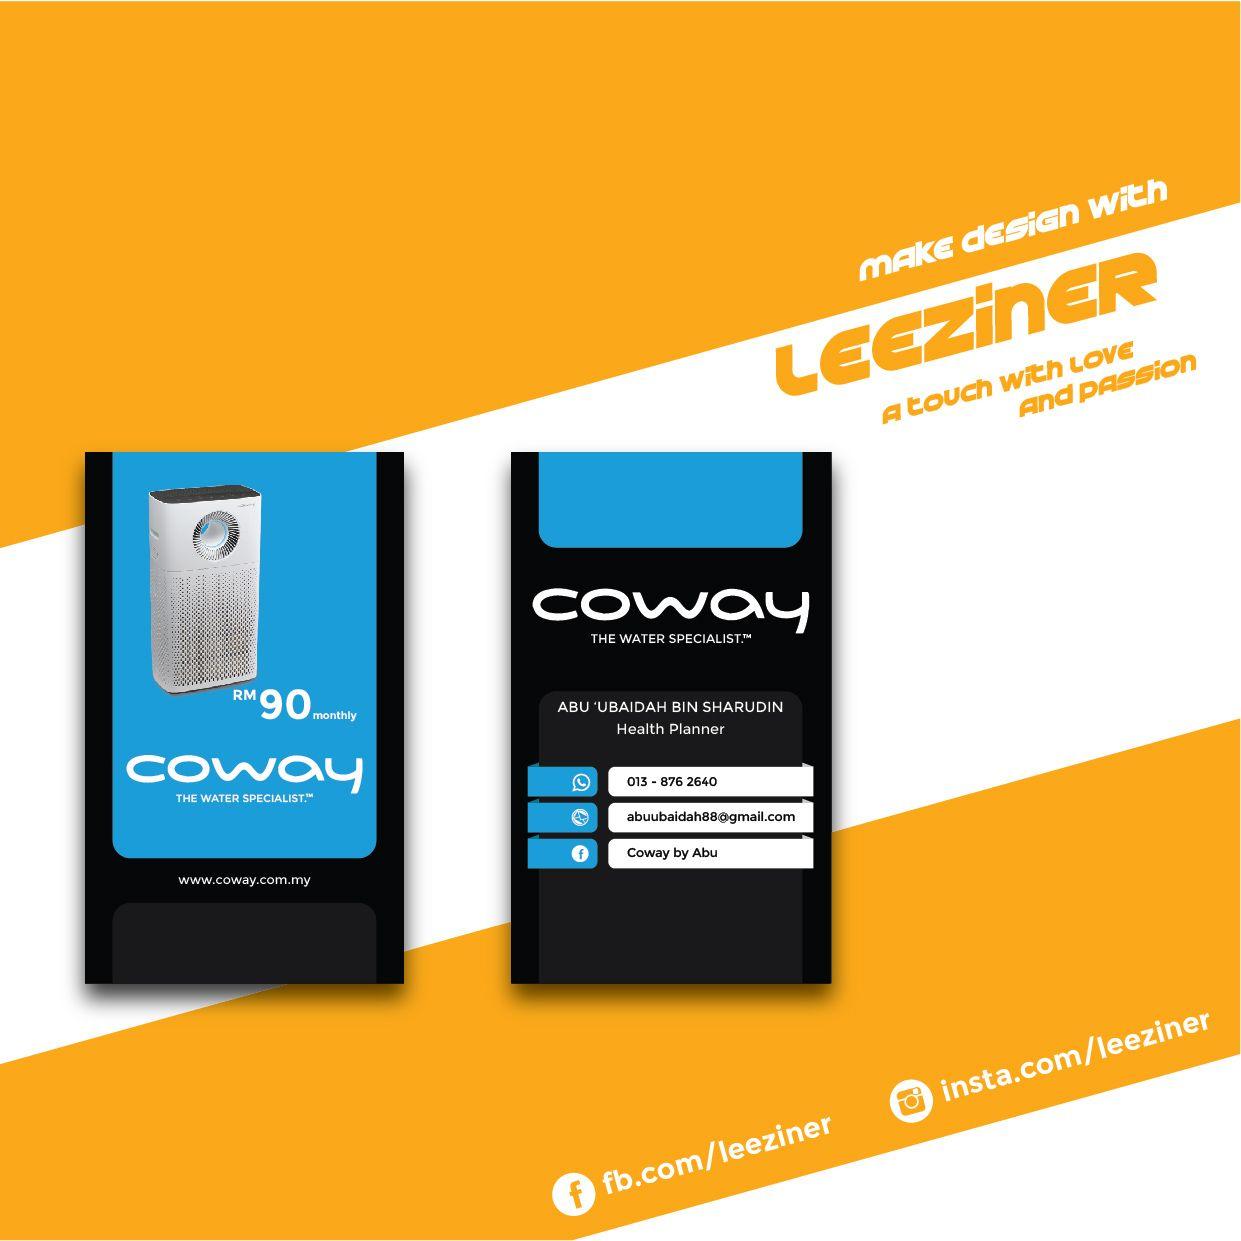 Coway Business Card Card Design Make Design Cards